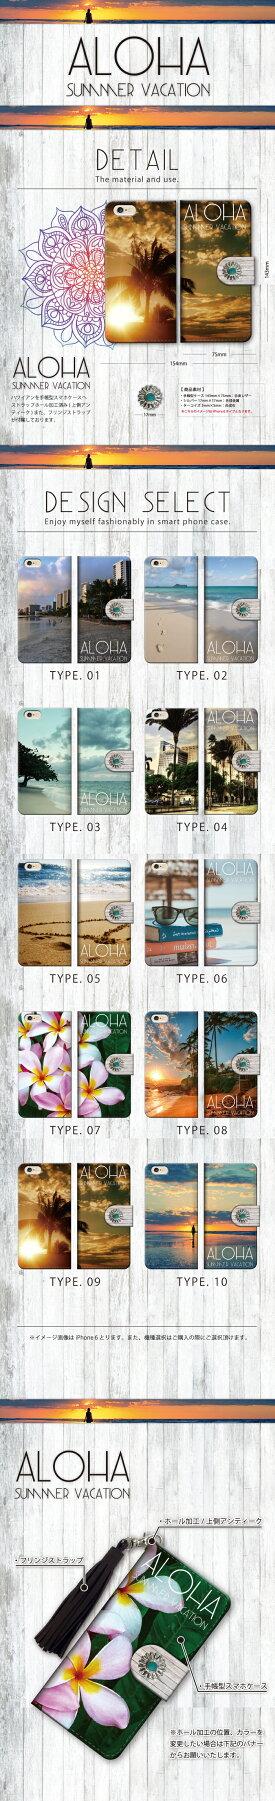 iPhone6ケースiPhone7ケーススマホケース全170機種対応アロハハワイアンプルメリアフリンジGALAXYXperiARROWSAQUOSMEDIASOptimusELUGADisneyMobileDIGNOLGisainexusGirl